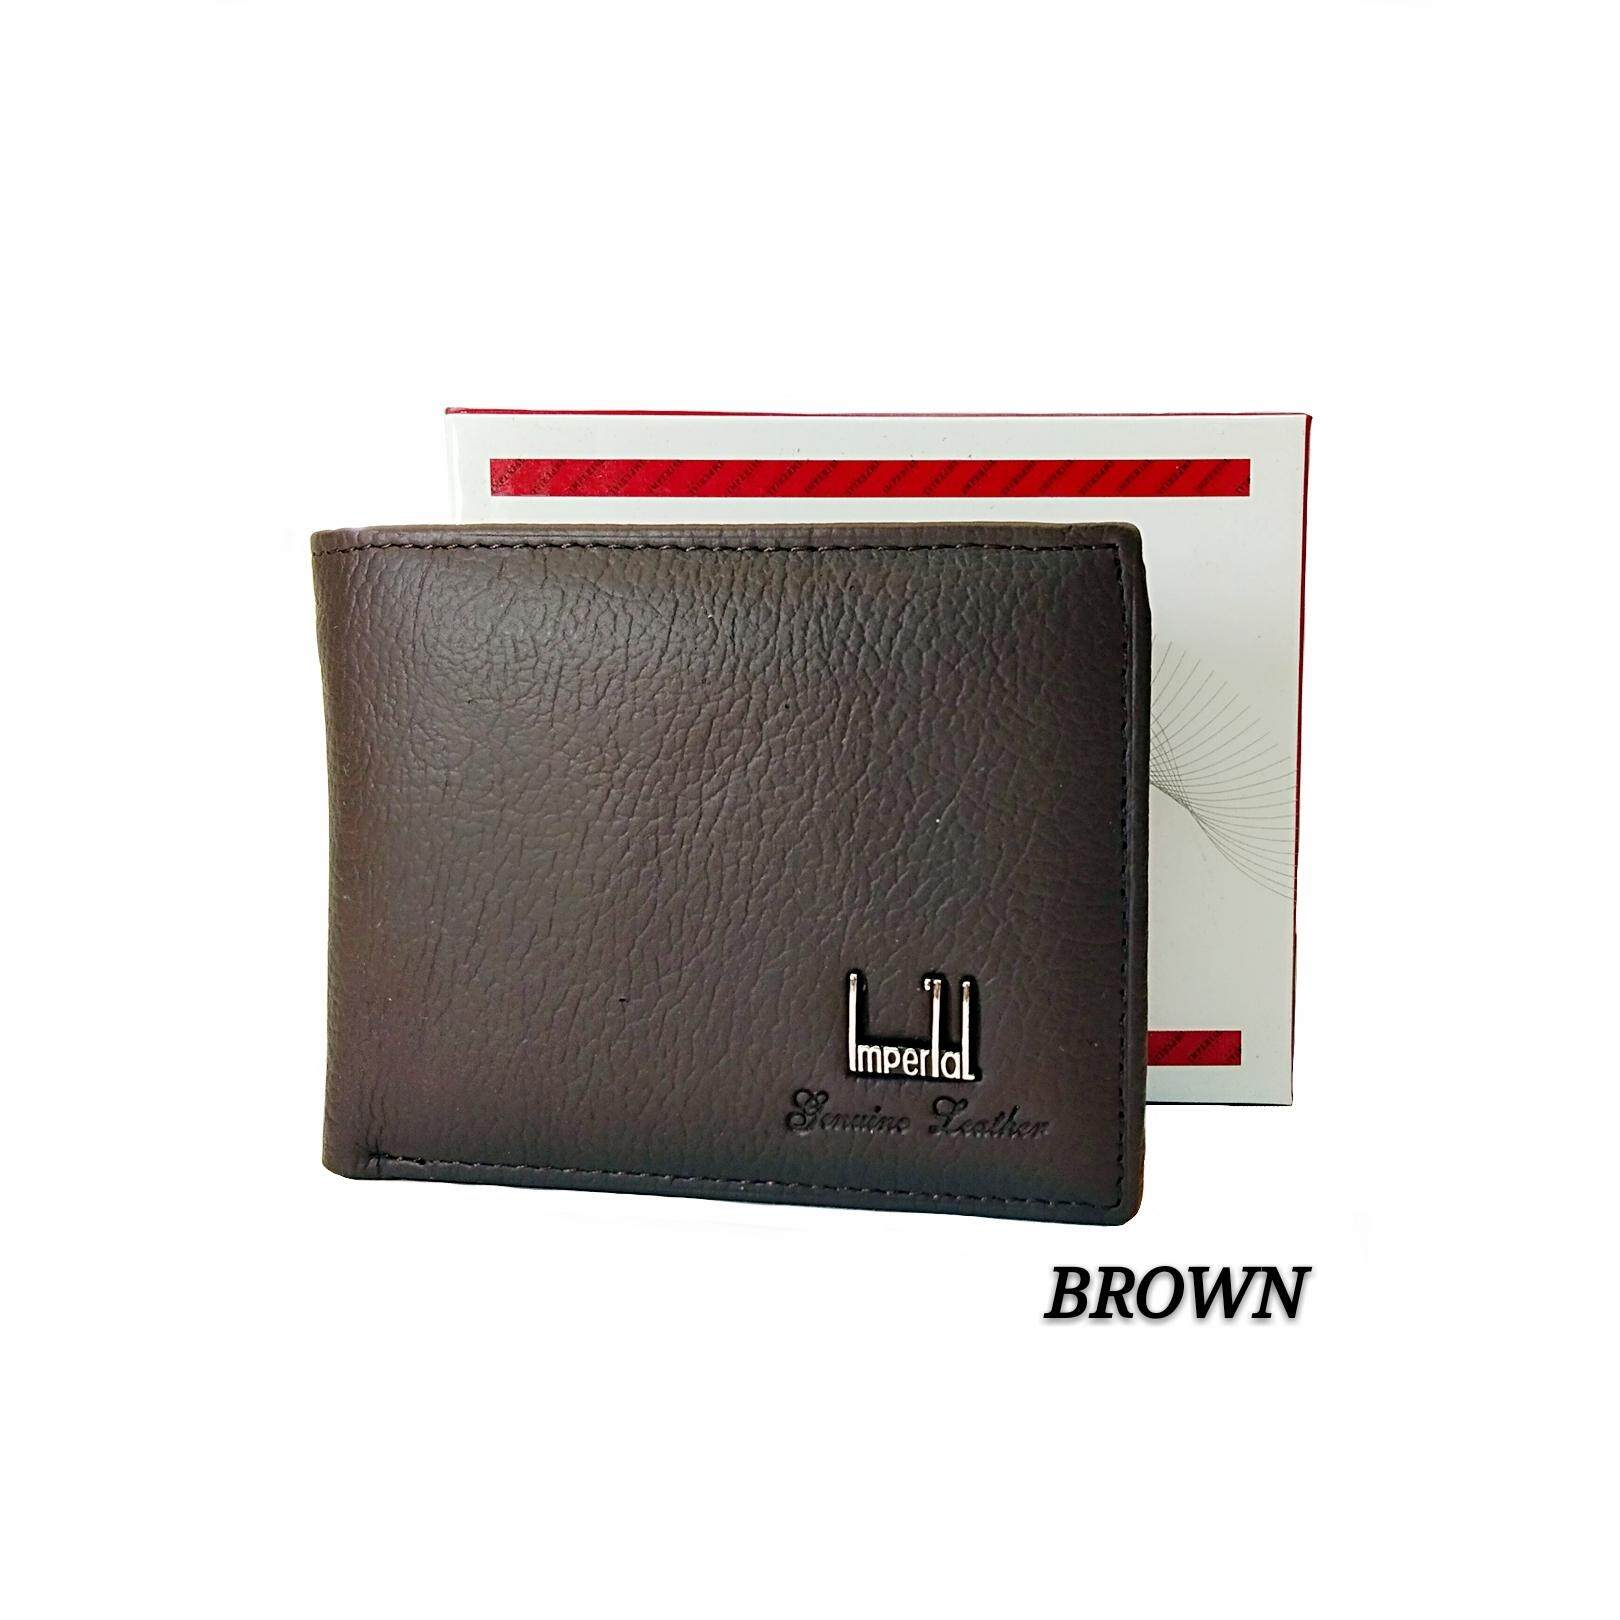 Imperial 100% Genuine Real Leather Wallet Short Wallet Man Wallet Dompet Lelaki Kulit Betul